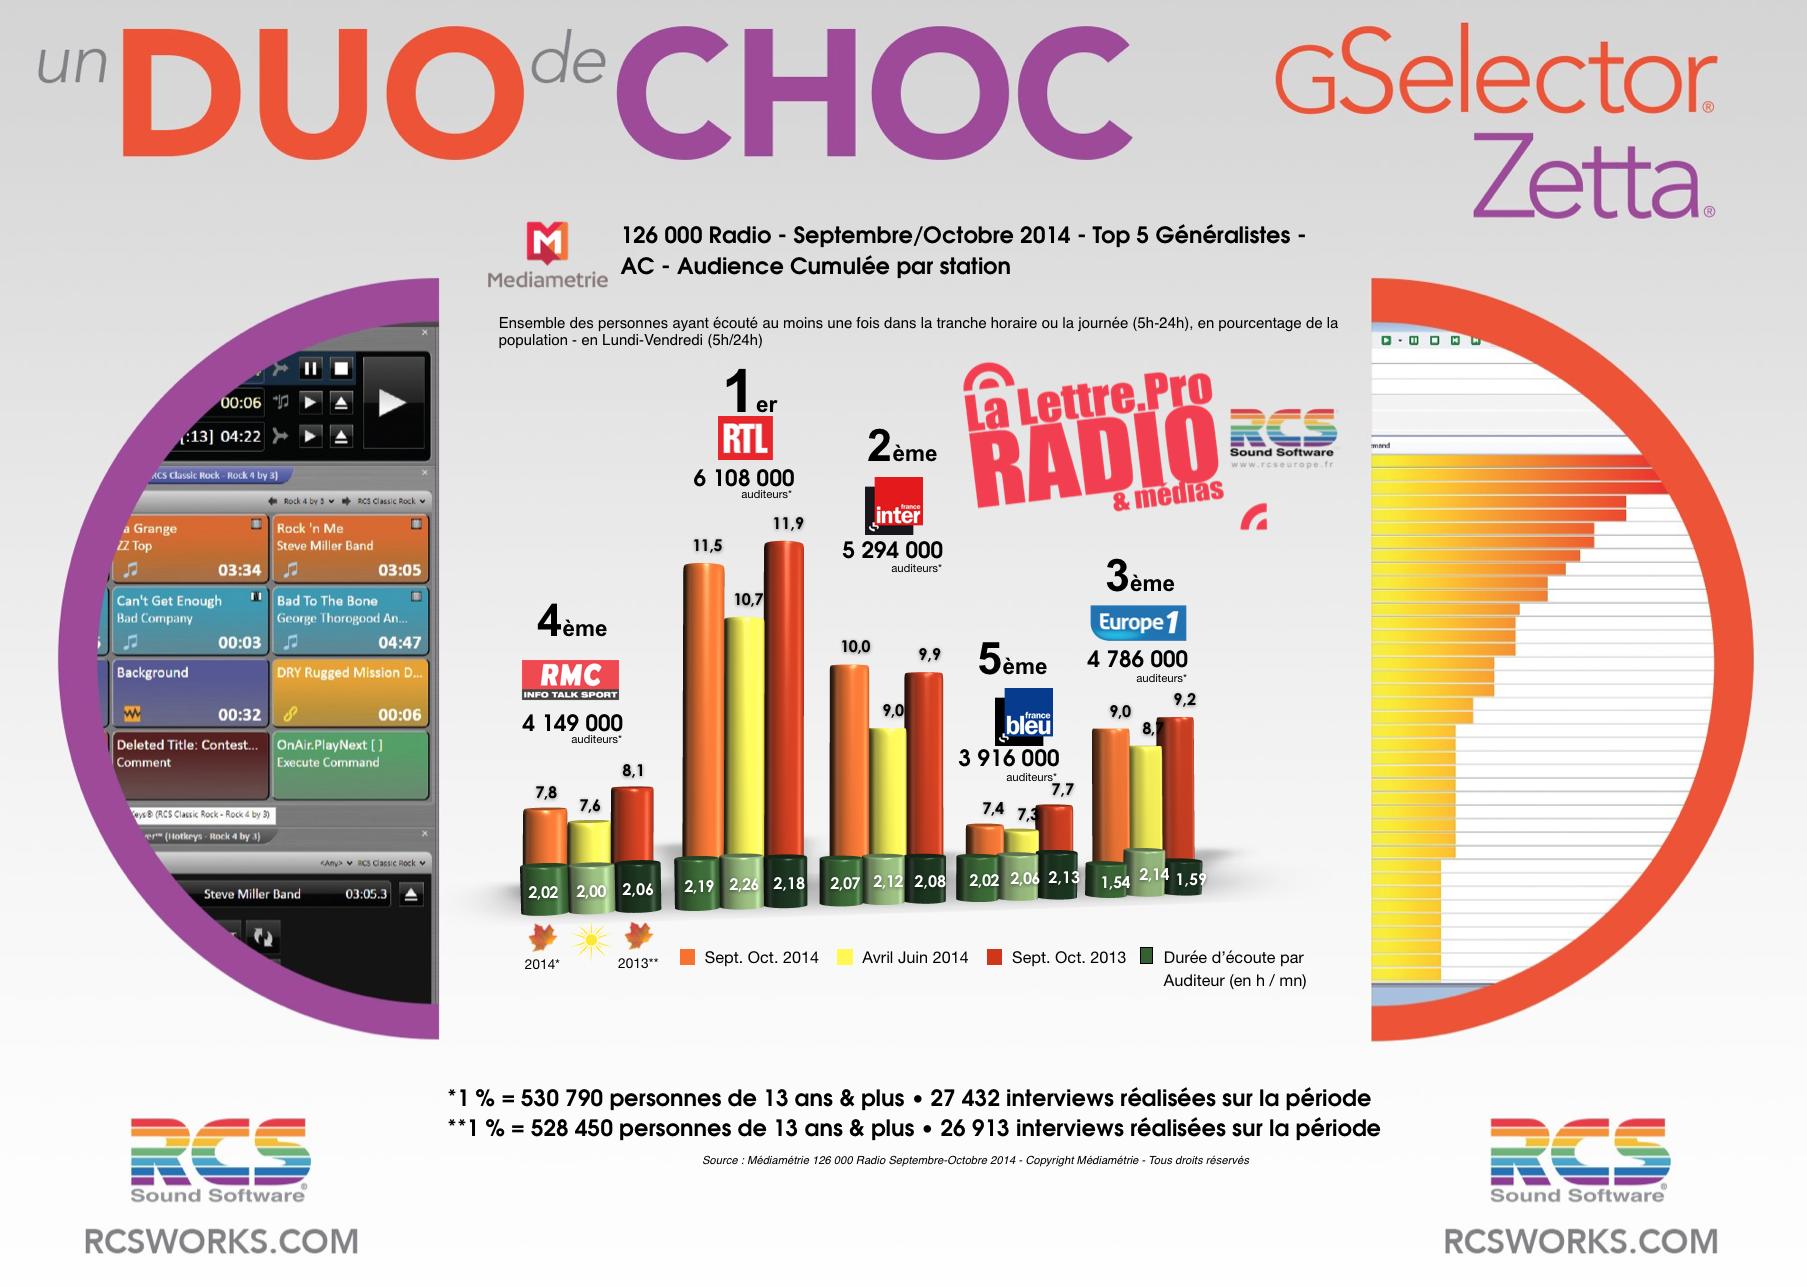 TOP 5 Généralistes - Diagramme exclusif LLP/RCS GSelector-Zetta - Septembre-Octobre 2014